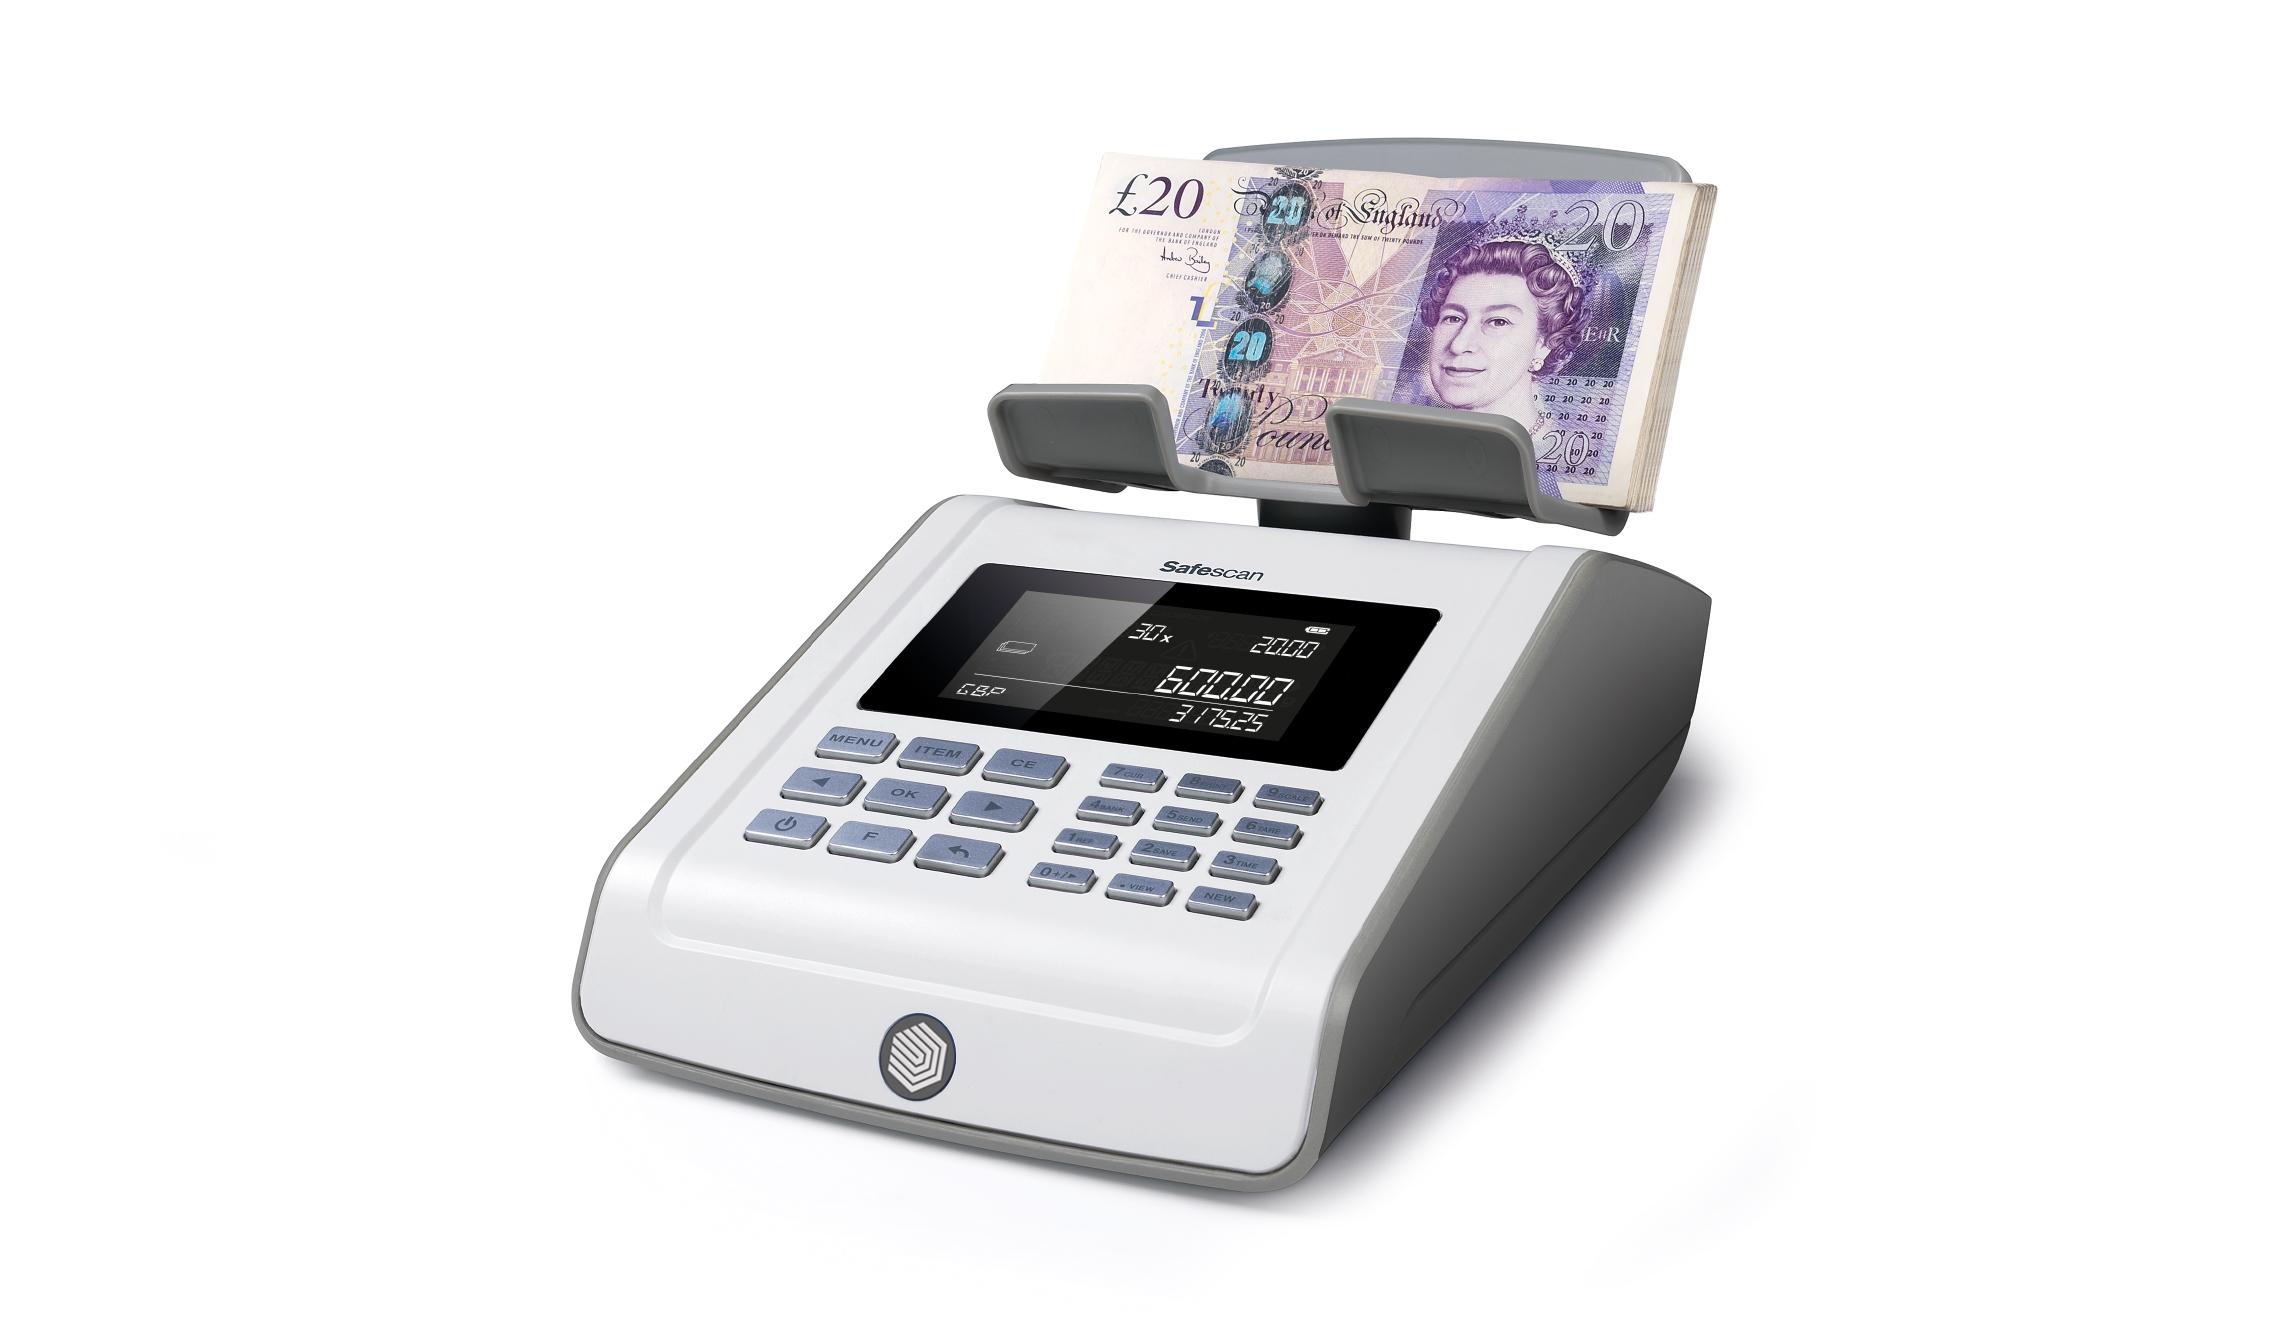 safescan-6185-banknote-counter